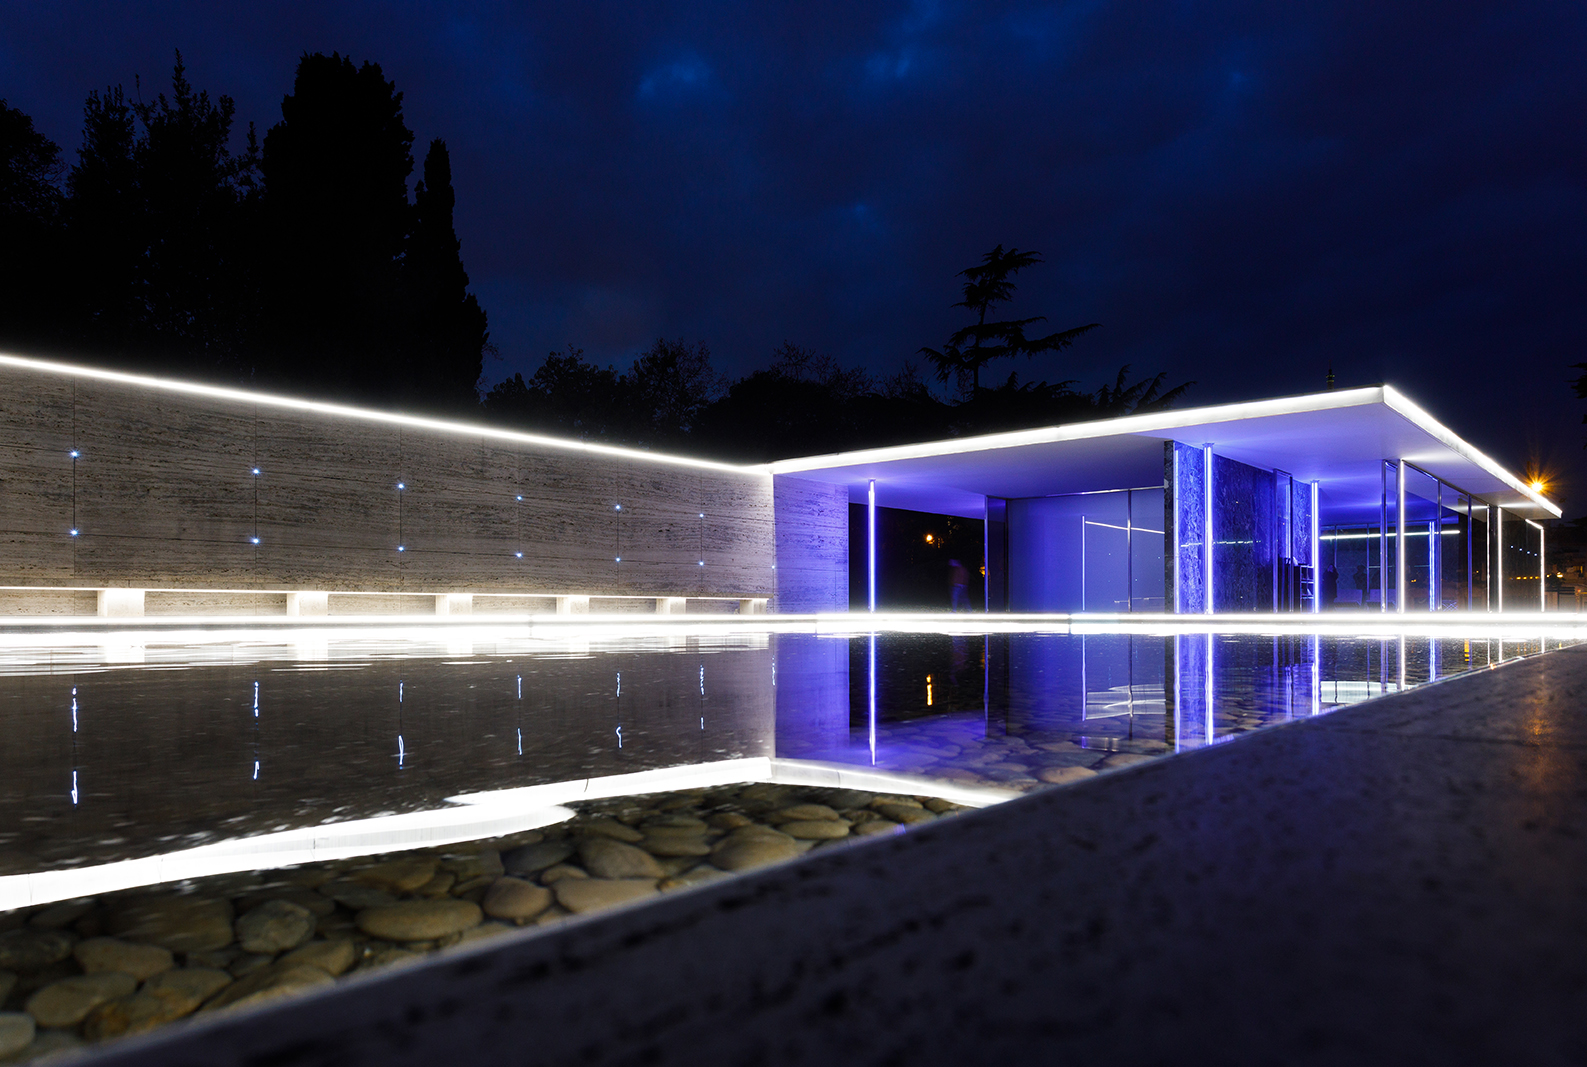 BIG BANG BUILDING LIGHT! - Mario Pasqualotto – gener 2020 - Pavelló Mies van der Rohe – Barcelona